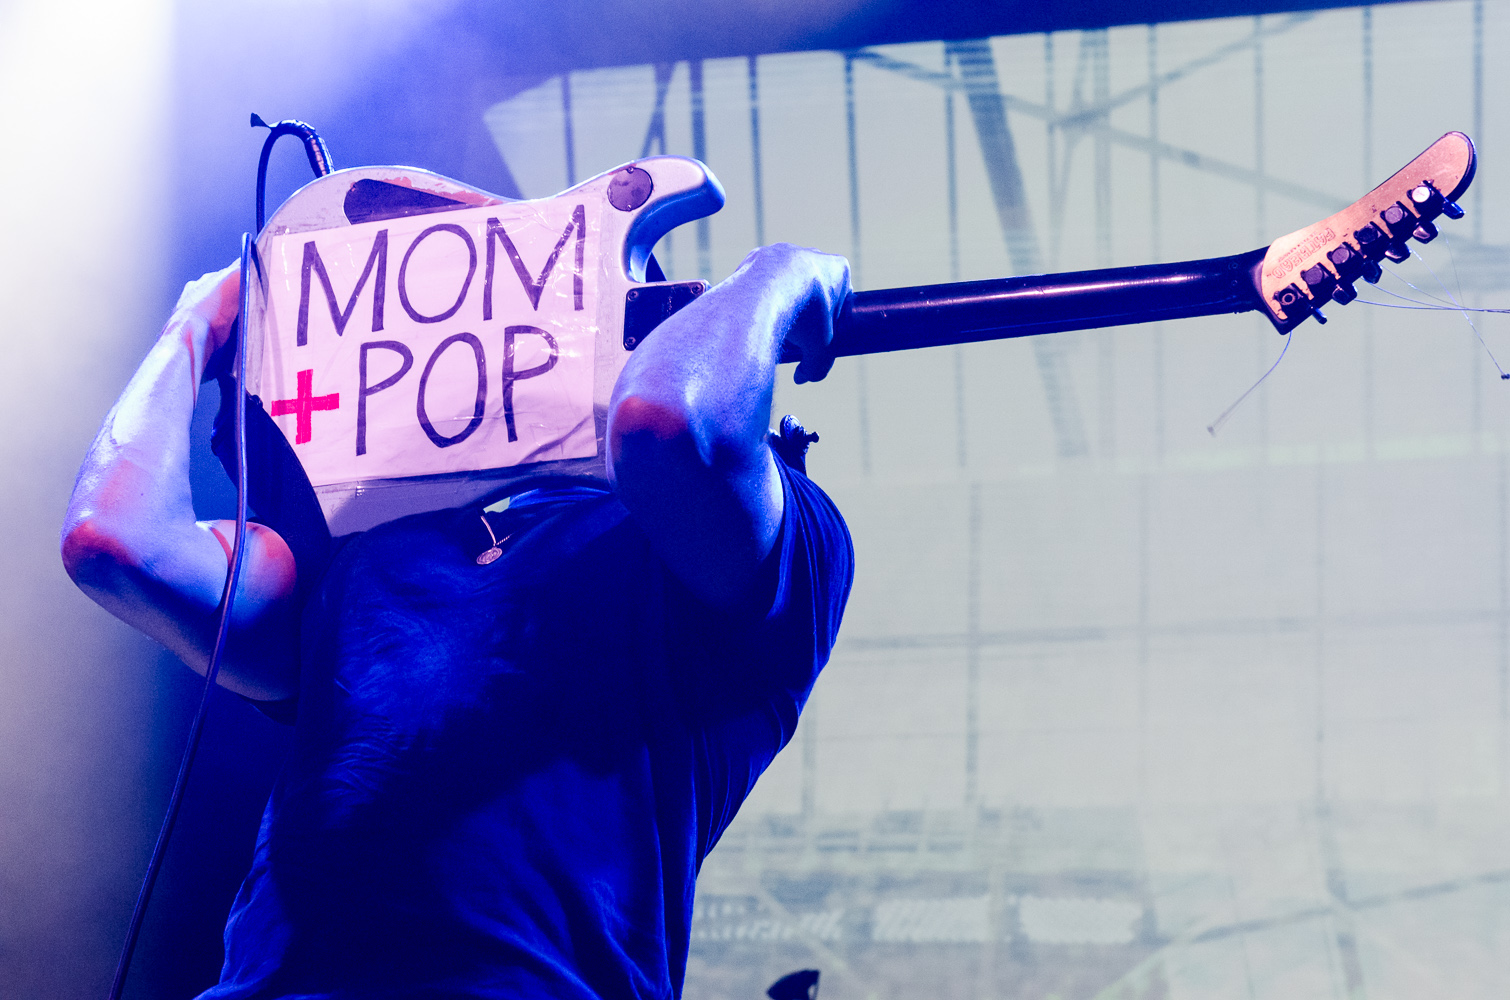 Mom+Pop 10th Anniversary Ben Kaye Tom Morello